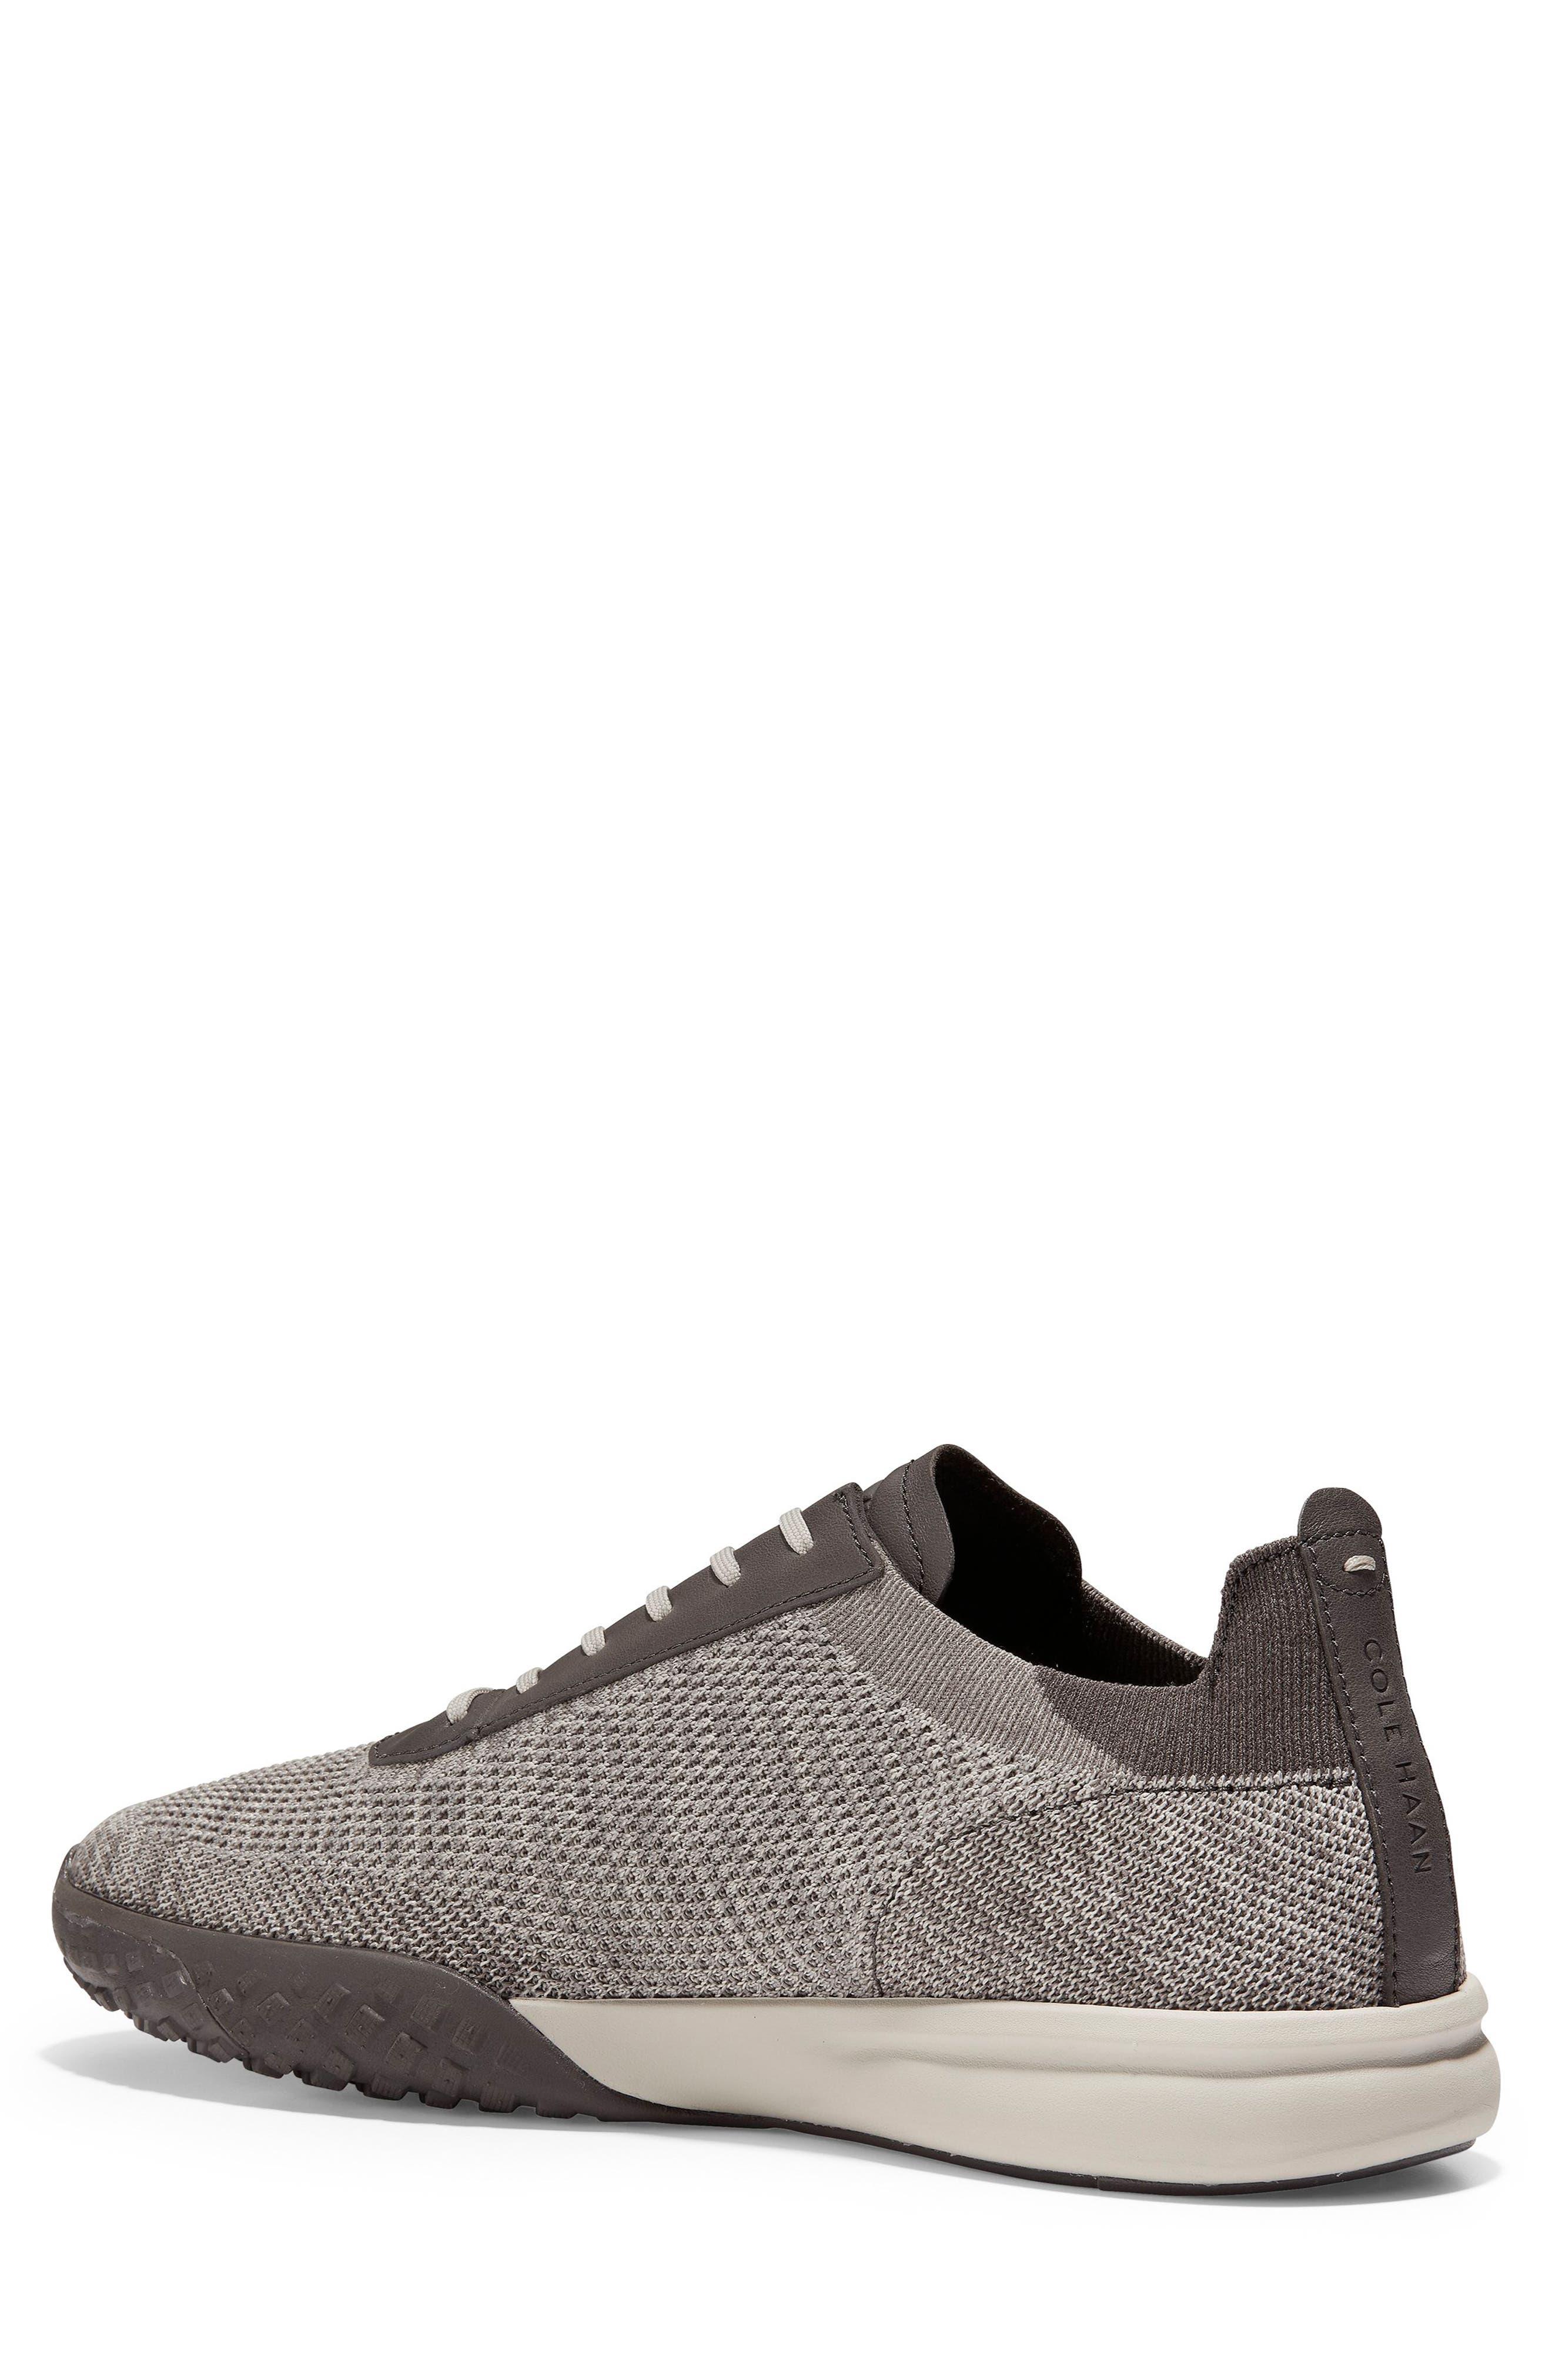 GrandPro Trail Low Stitchlite Sneaker,                             Alternate thumbnail 2, color,                             BLACK/ VAPOR GREY KNIT